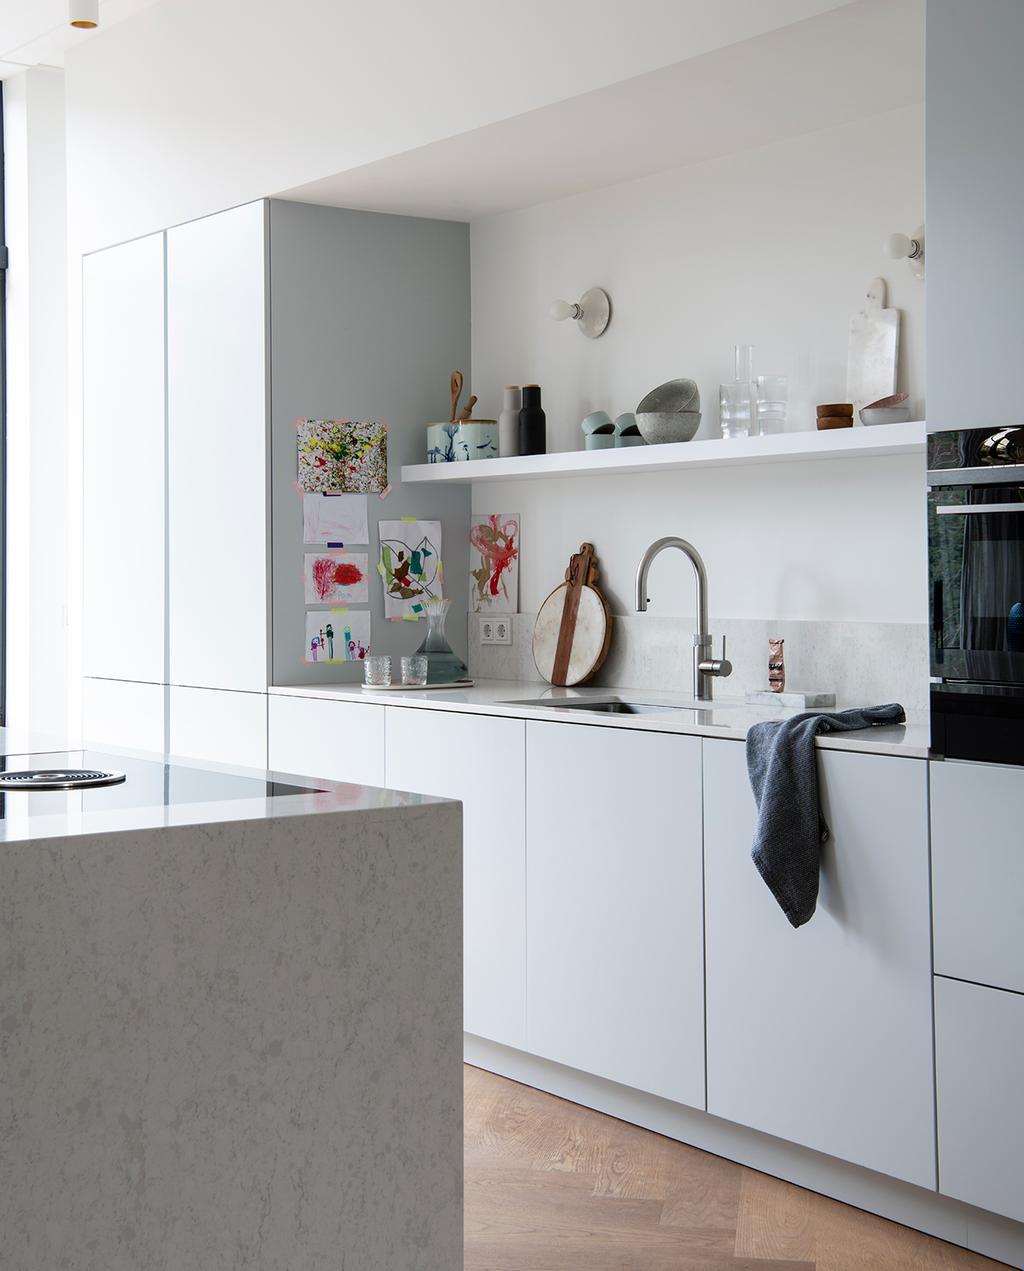 vtwonen 04-2021 | strakke keuken met greeploze kasten